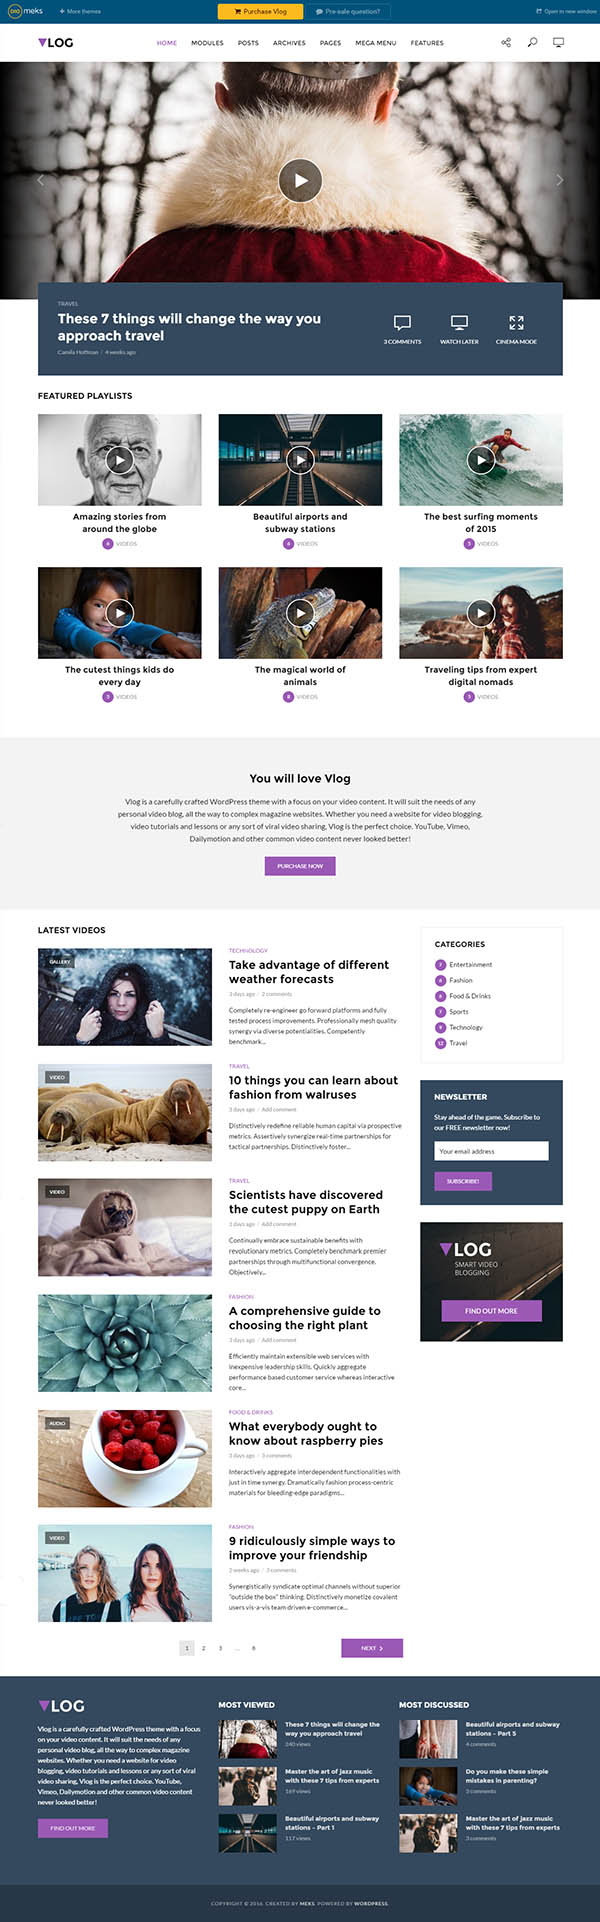 Vlog : Video Blog / Magazine WordPress Theme